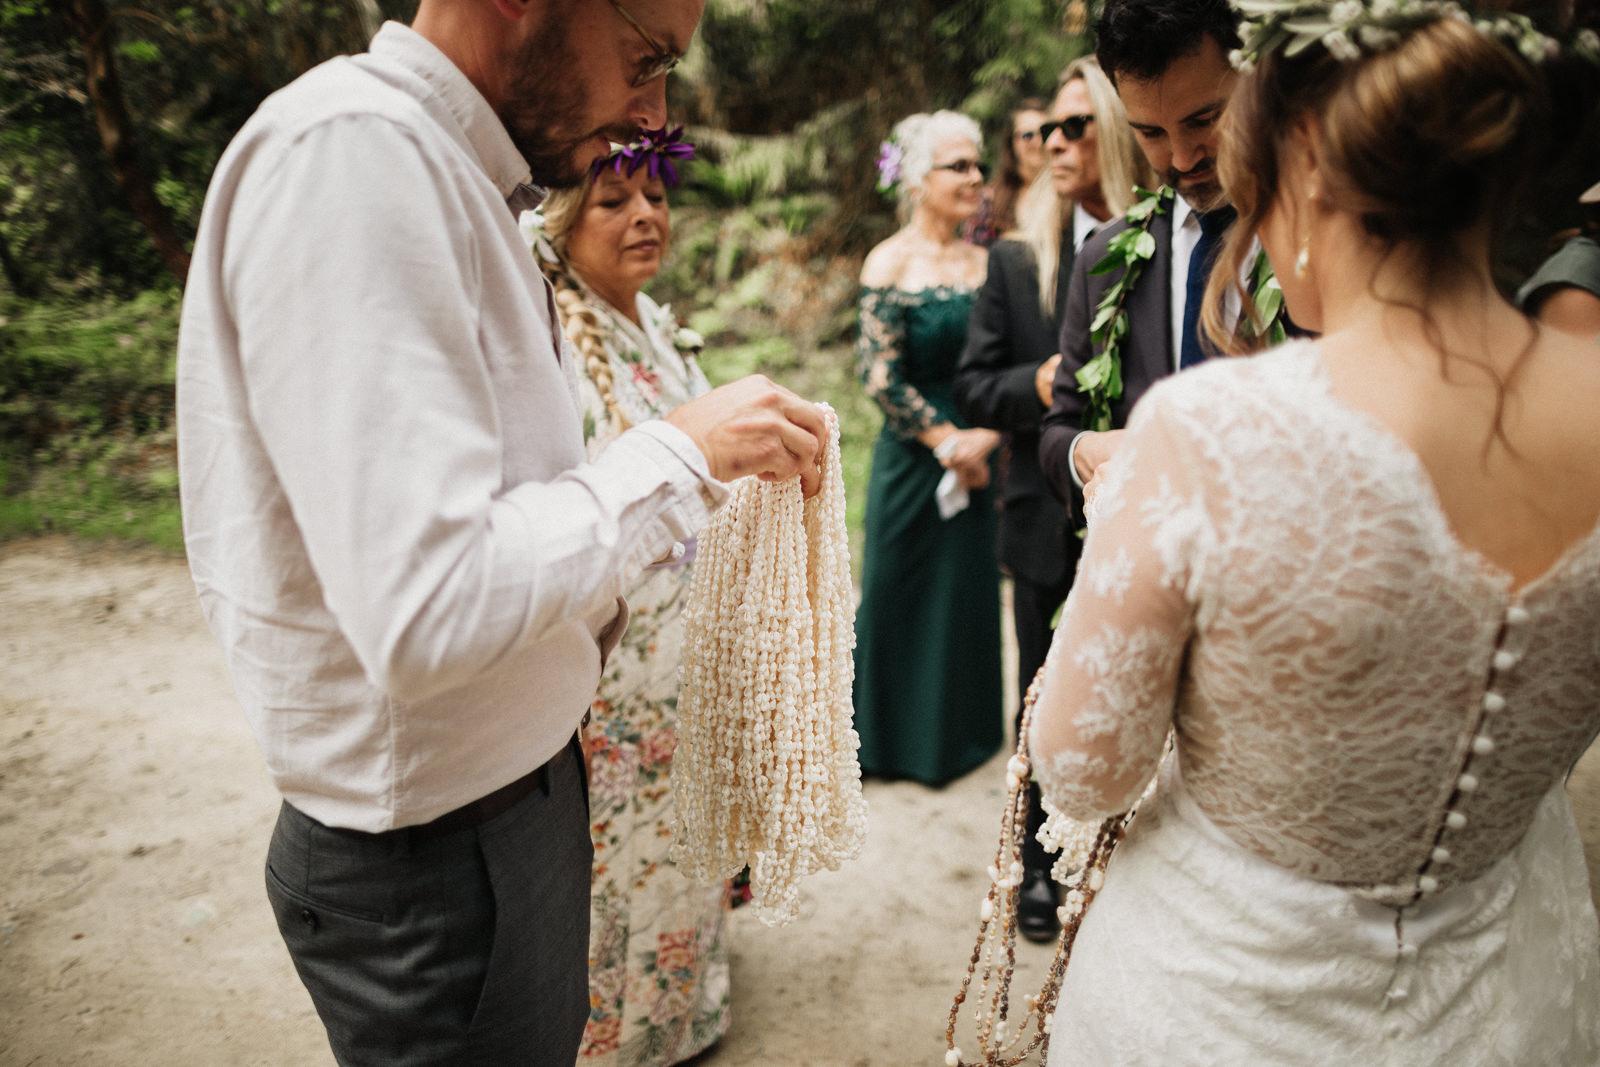 Bodega Ridge Galiano Island Wedding Photographer Kim Jay-49.jpg